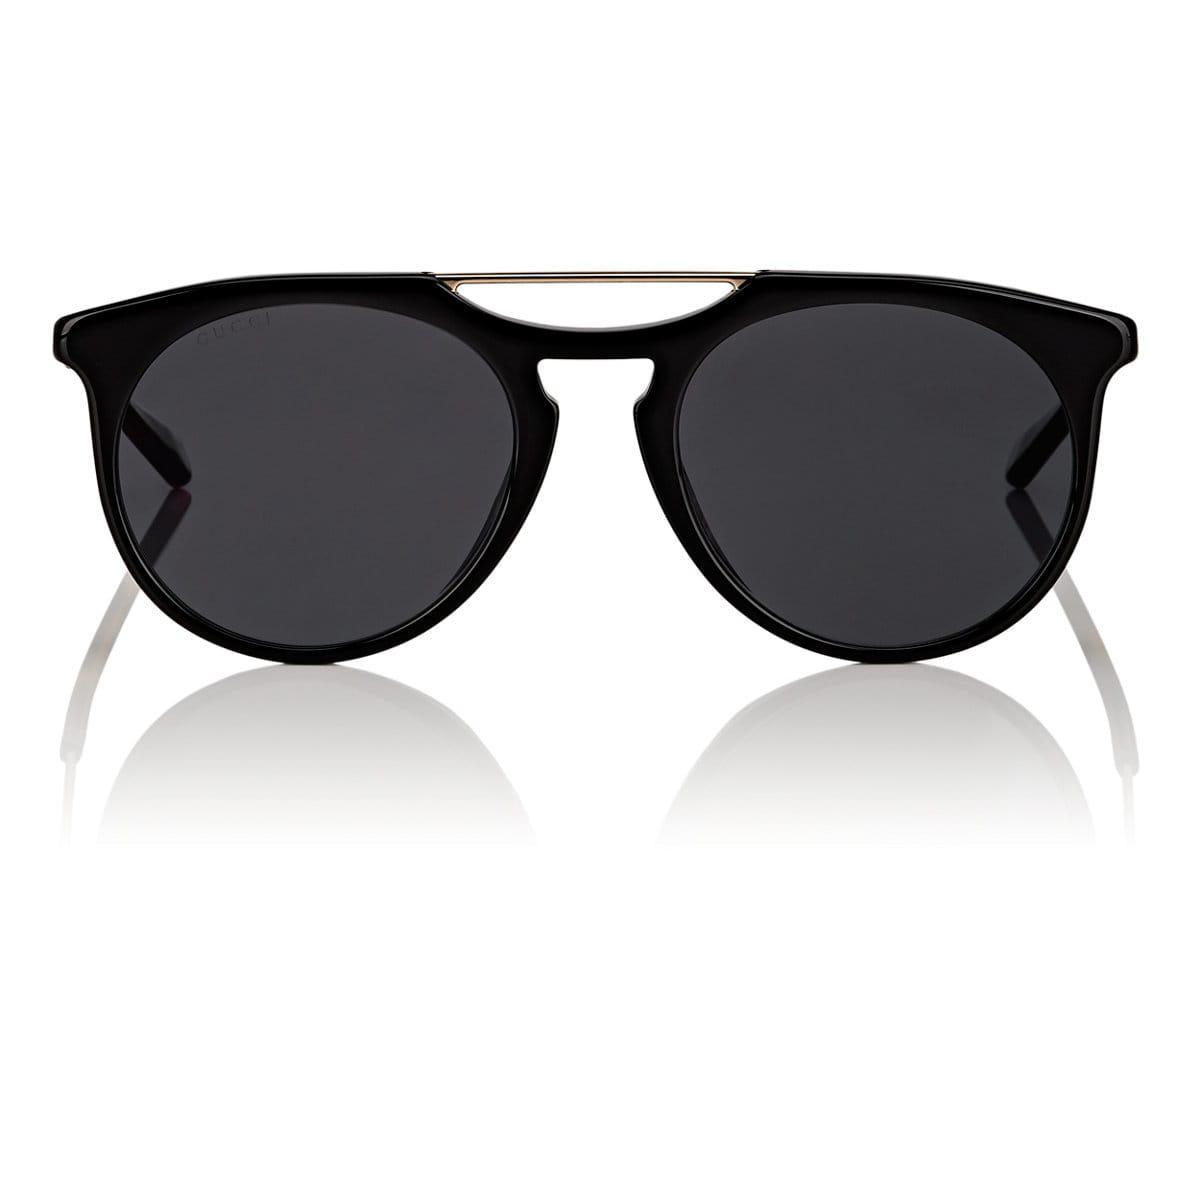 8ca18f7a1c Lyst - Gucci GG0320S Sunglasses in Brown for Men